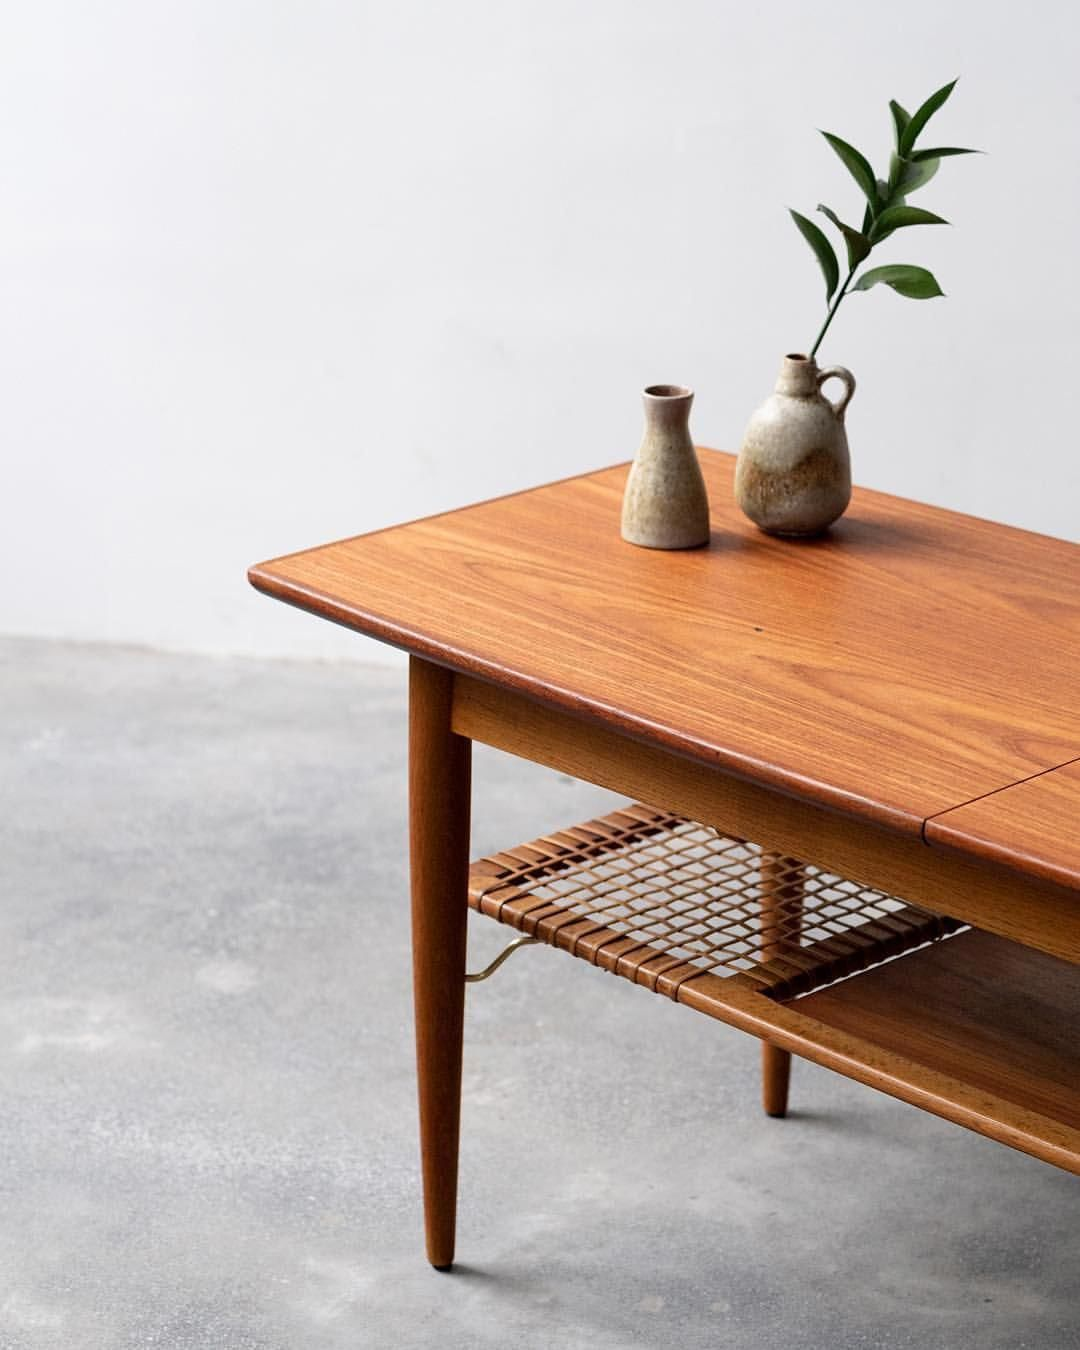 Beautiful Vintage Danish Coffee Table In Teak Solid Oak Legs Underlying Magazine Shelf In Teak And Wick Danish Coffee Table Coffee Table Coffee Table Vintage [ 1350 x 1080 Pixel ]